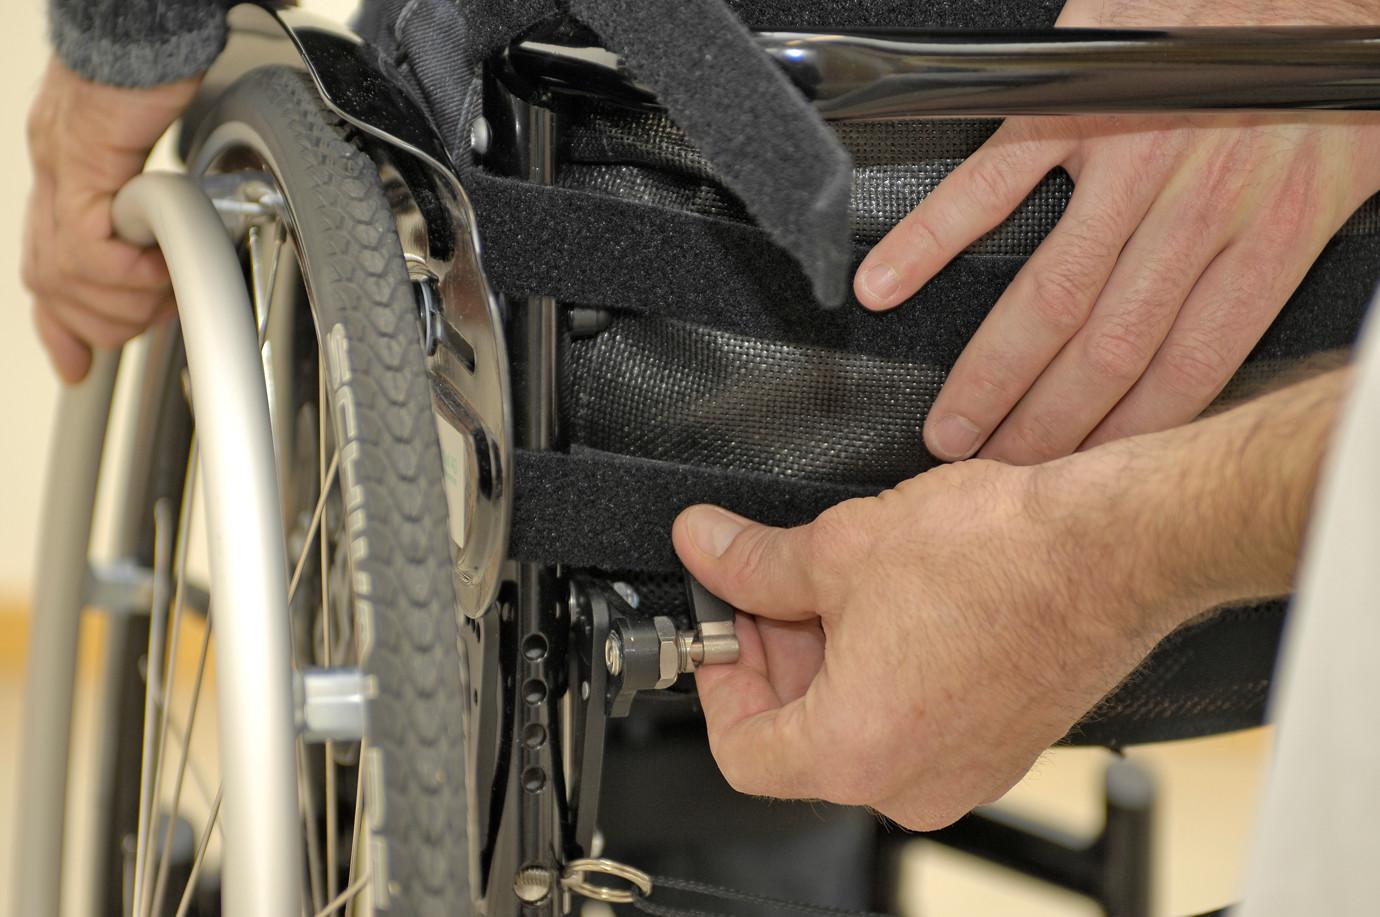 Wheelchair adaption